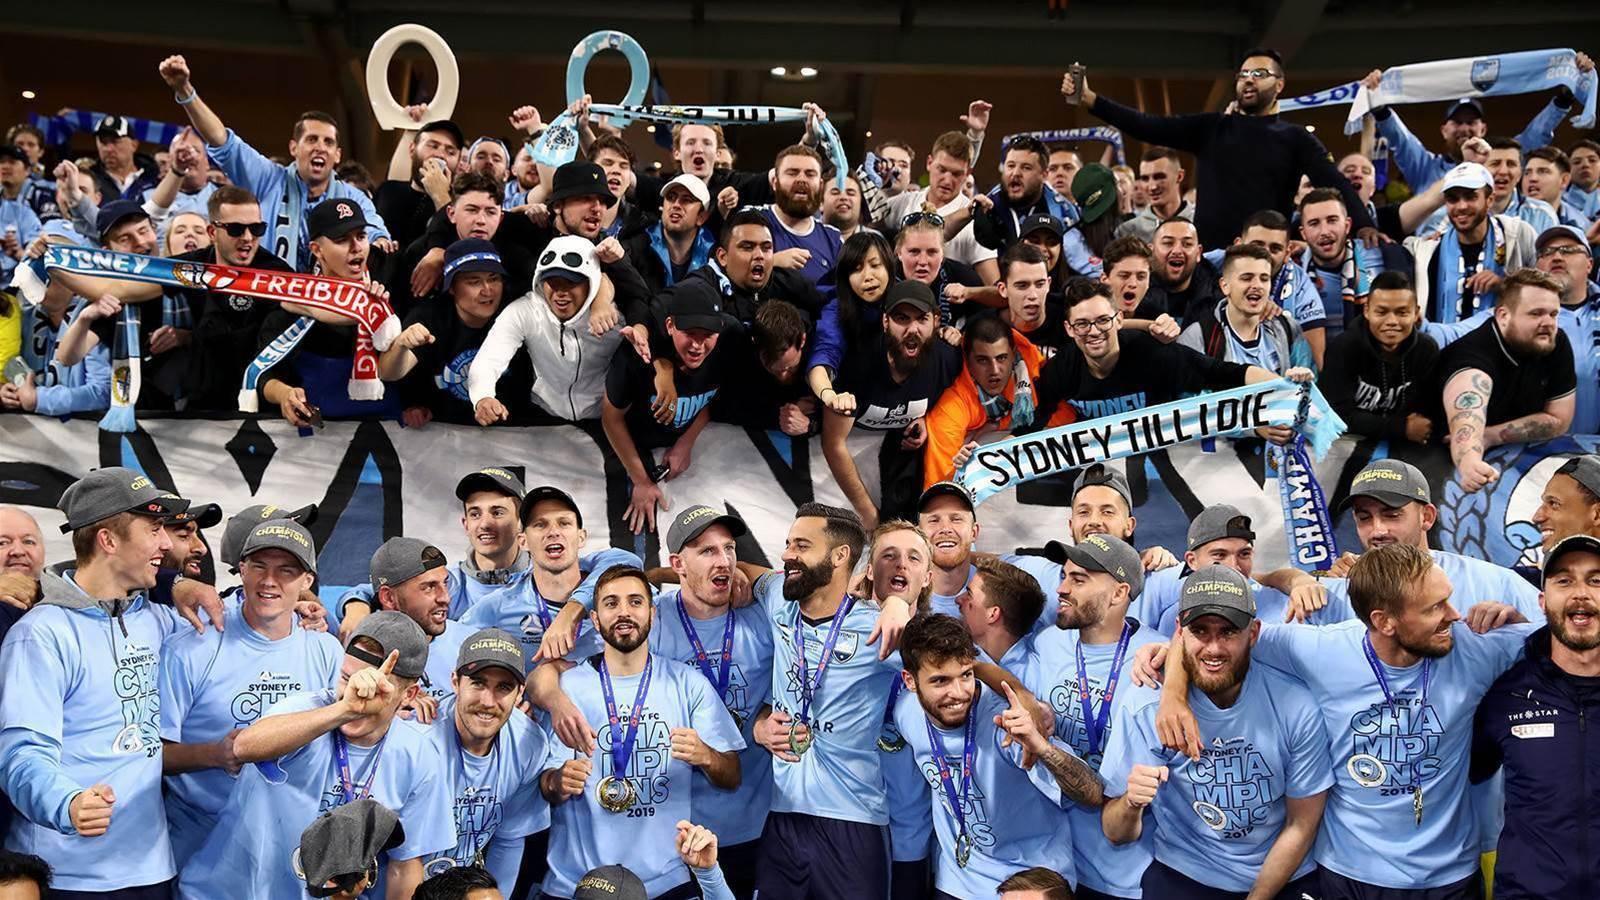 Sydney head home as A-League Champions